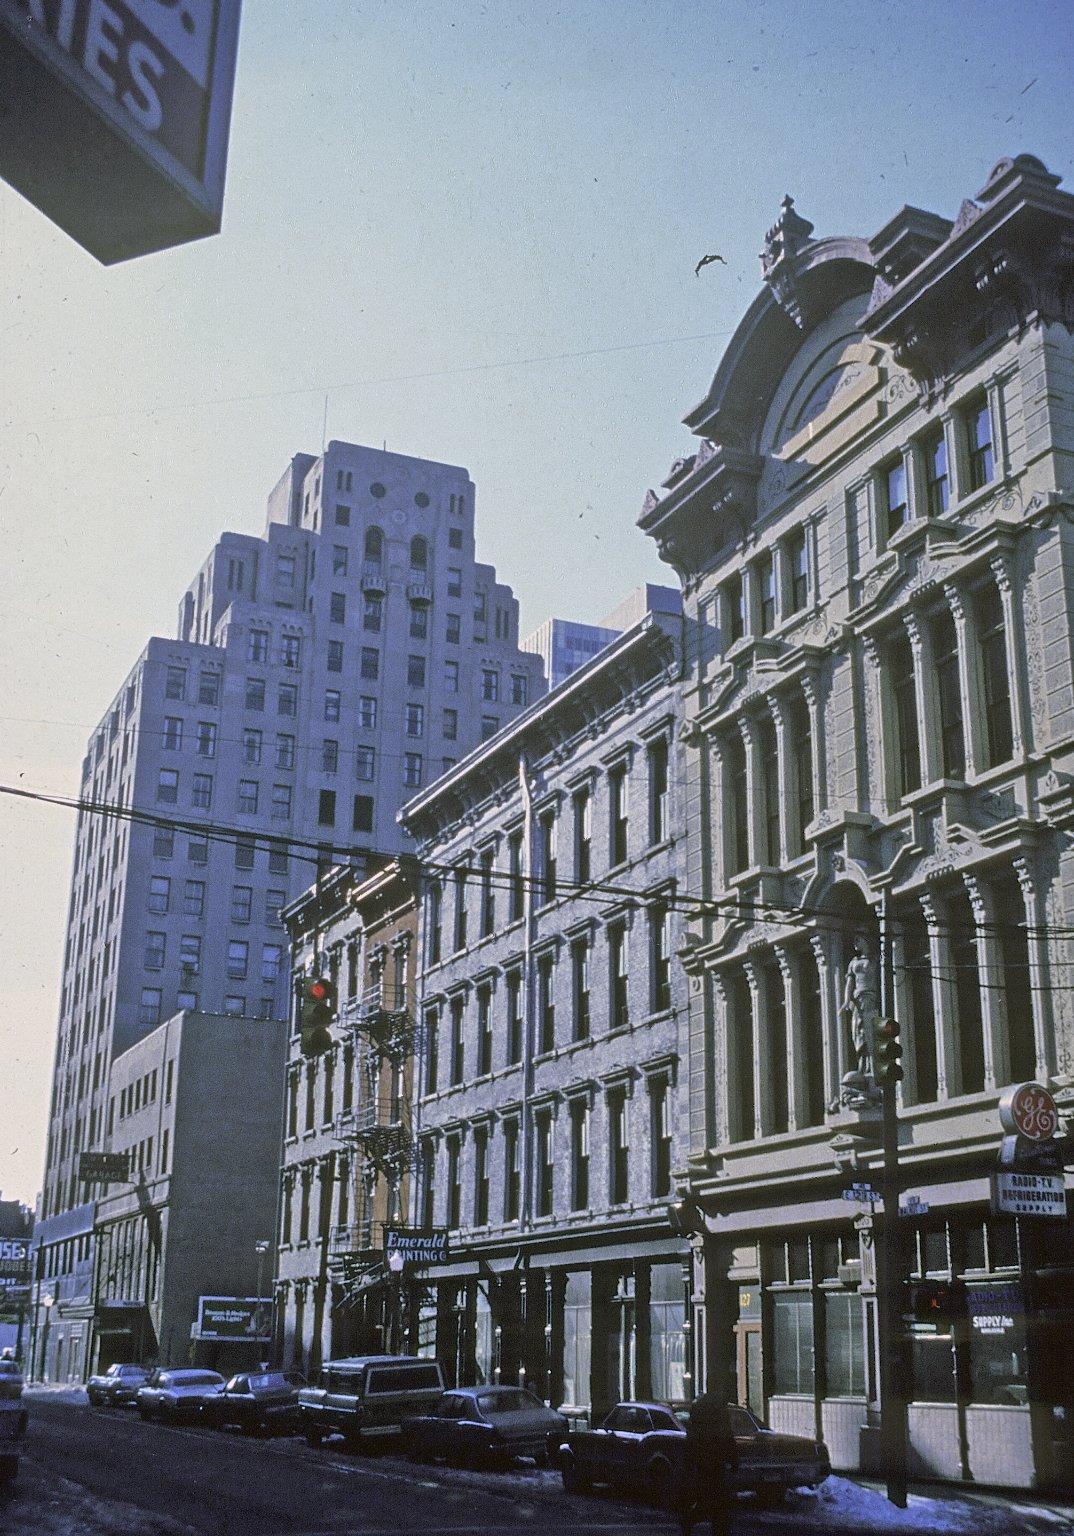 Walnut Street, Over-the-Rhine, Cincinnati, Ohio